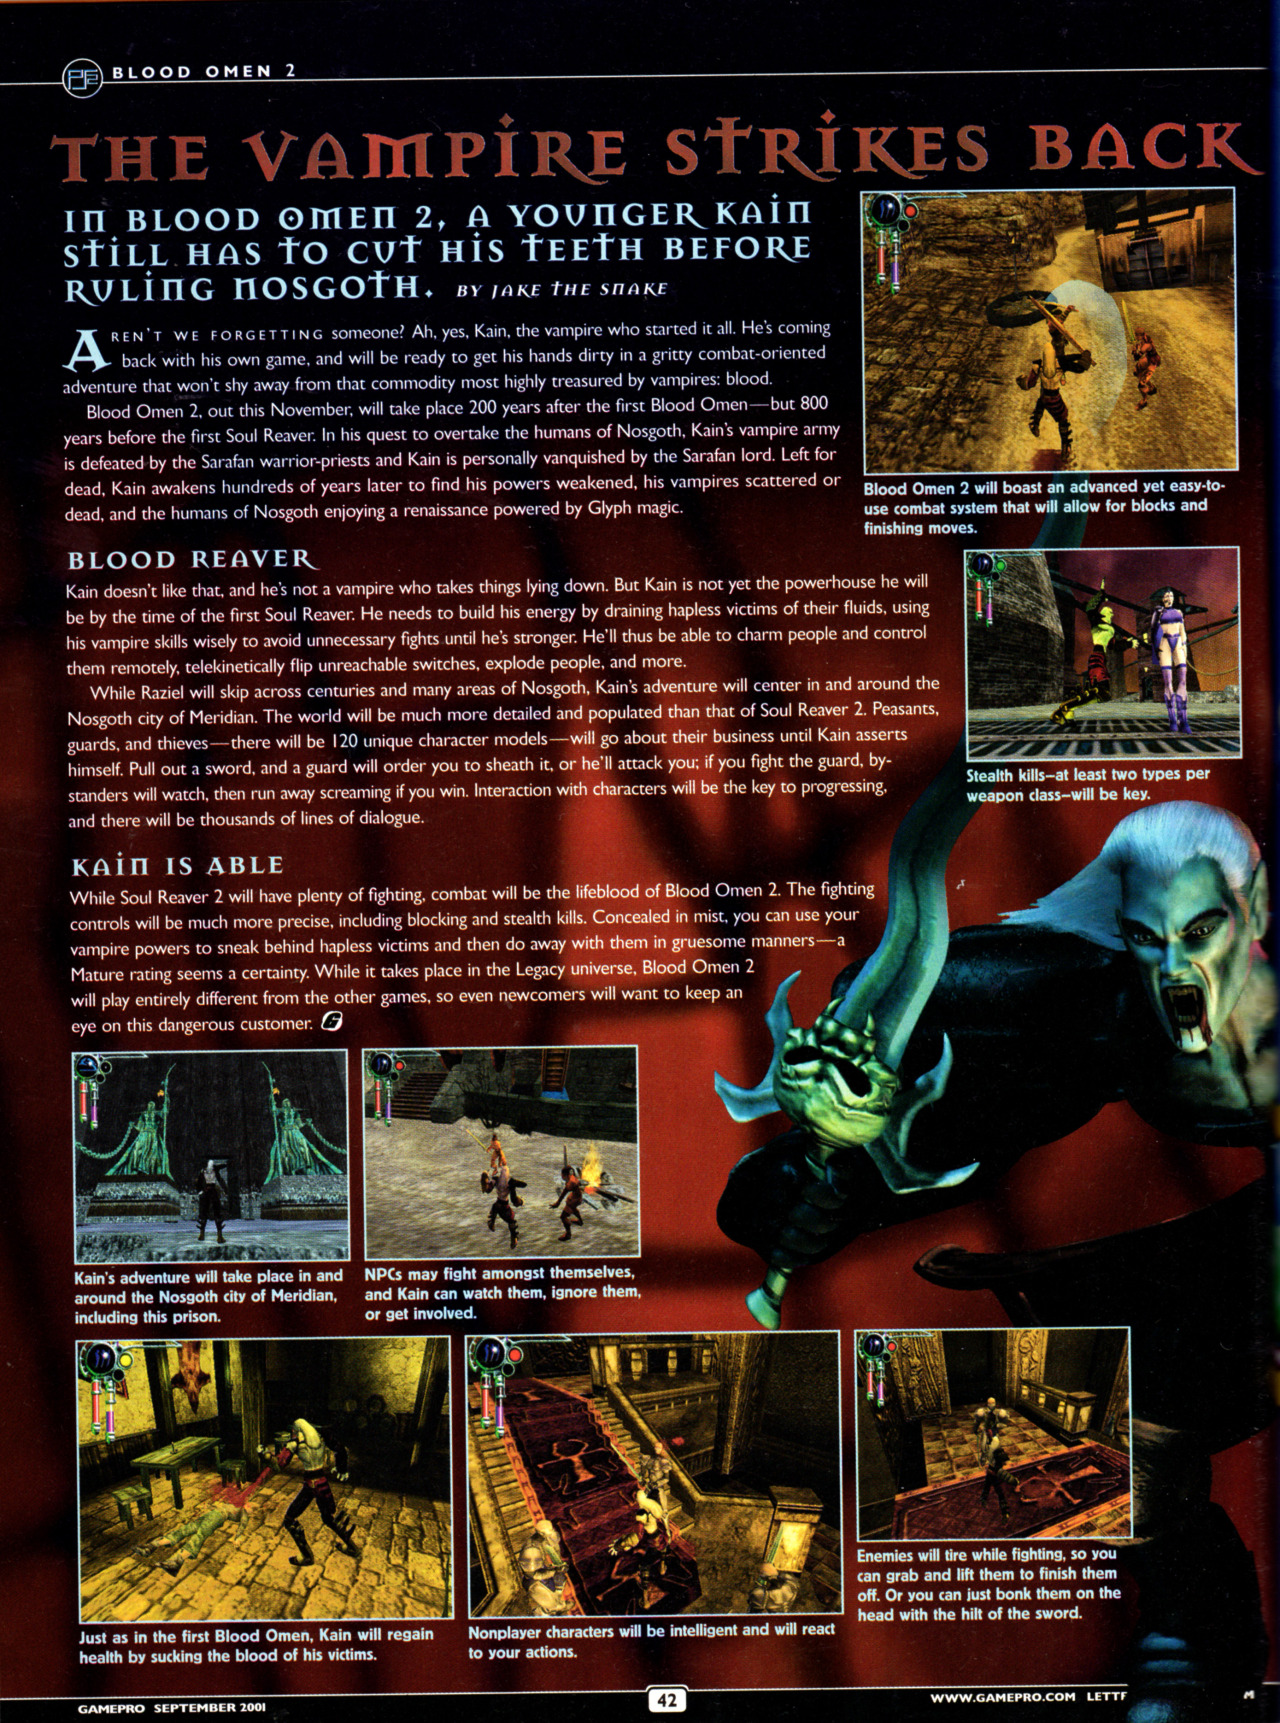 GamePro-71-6.jpg